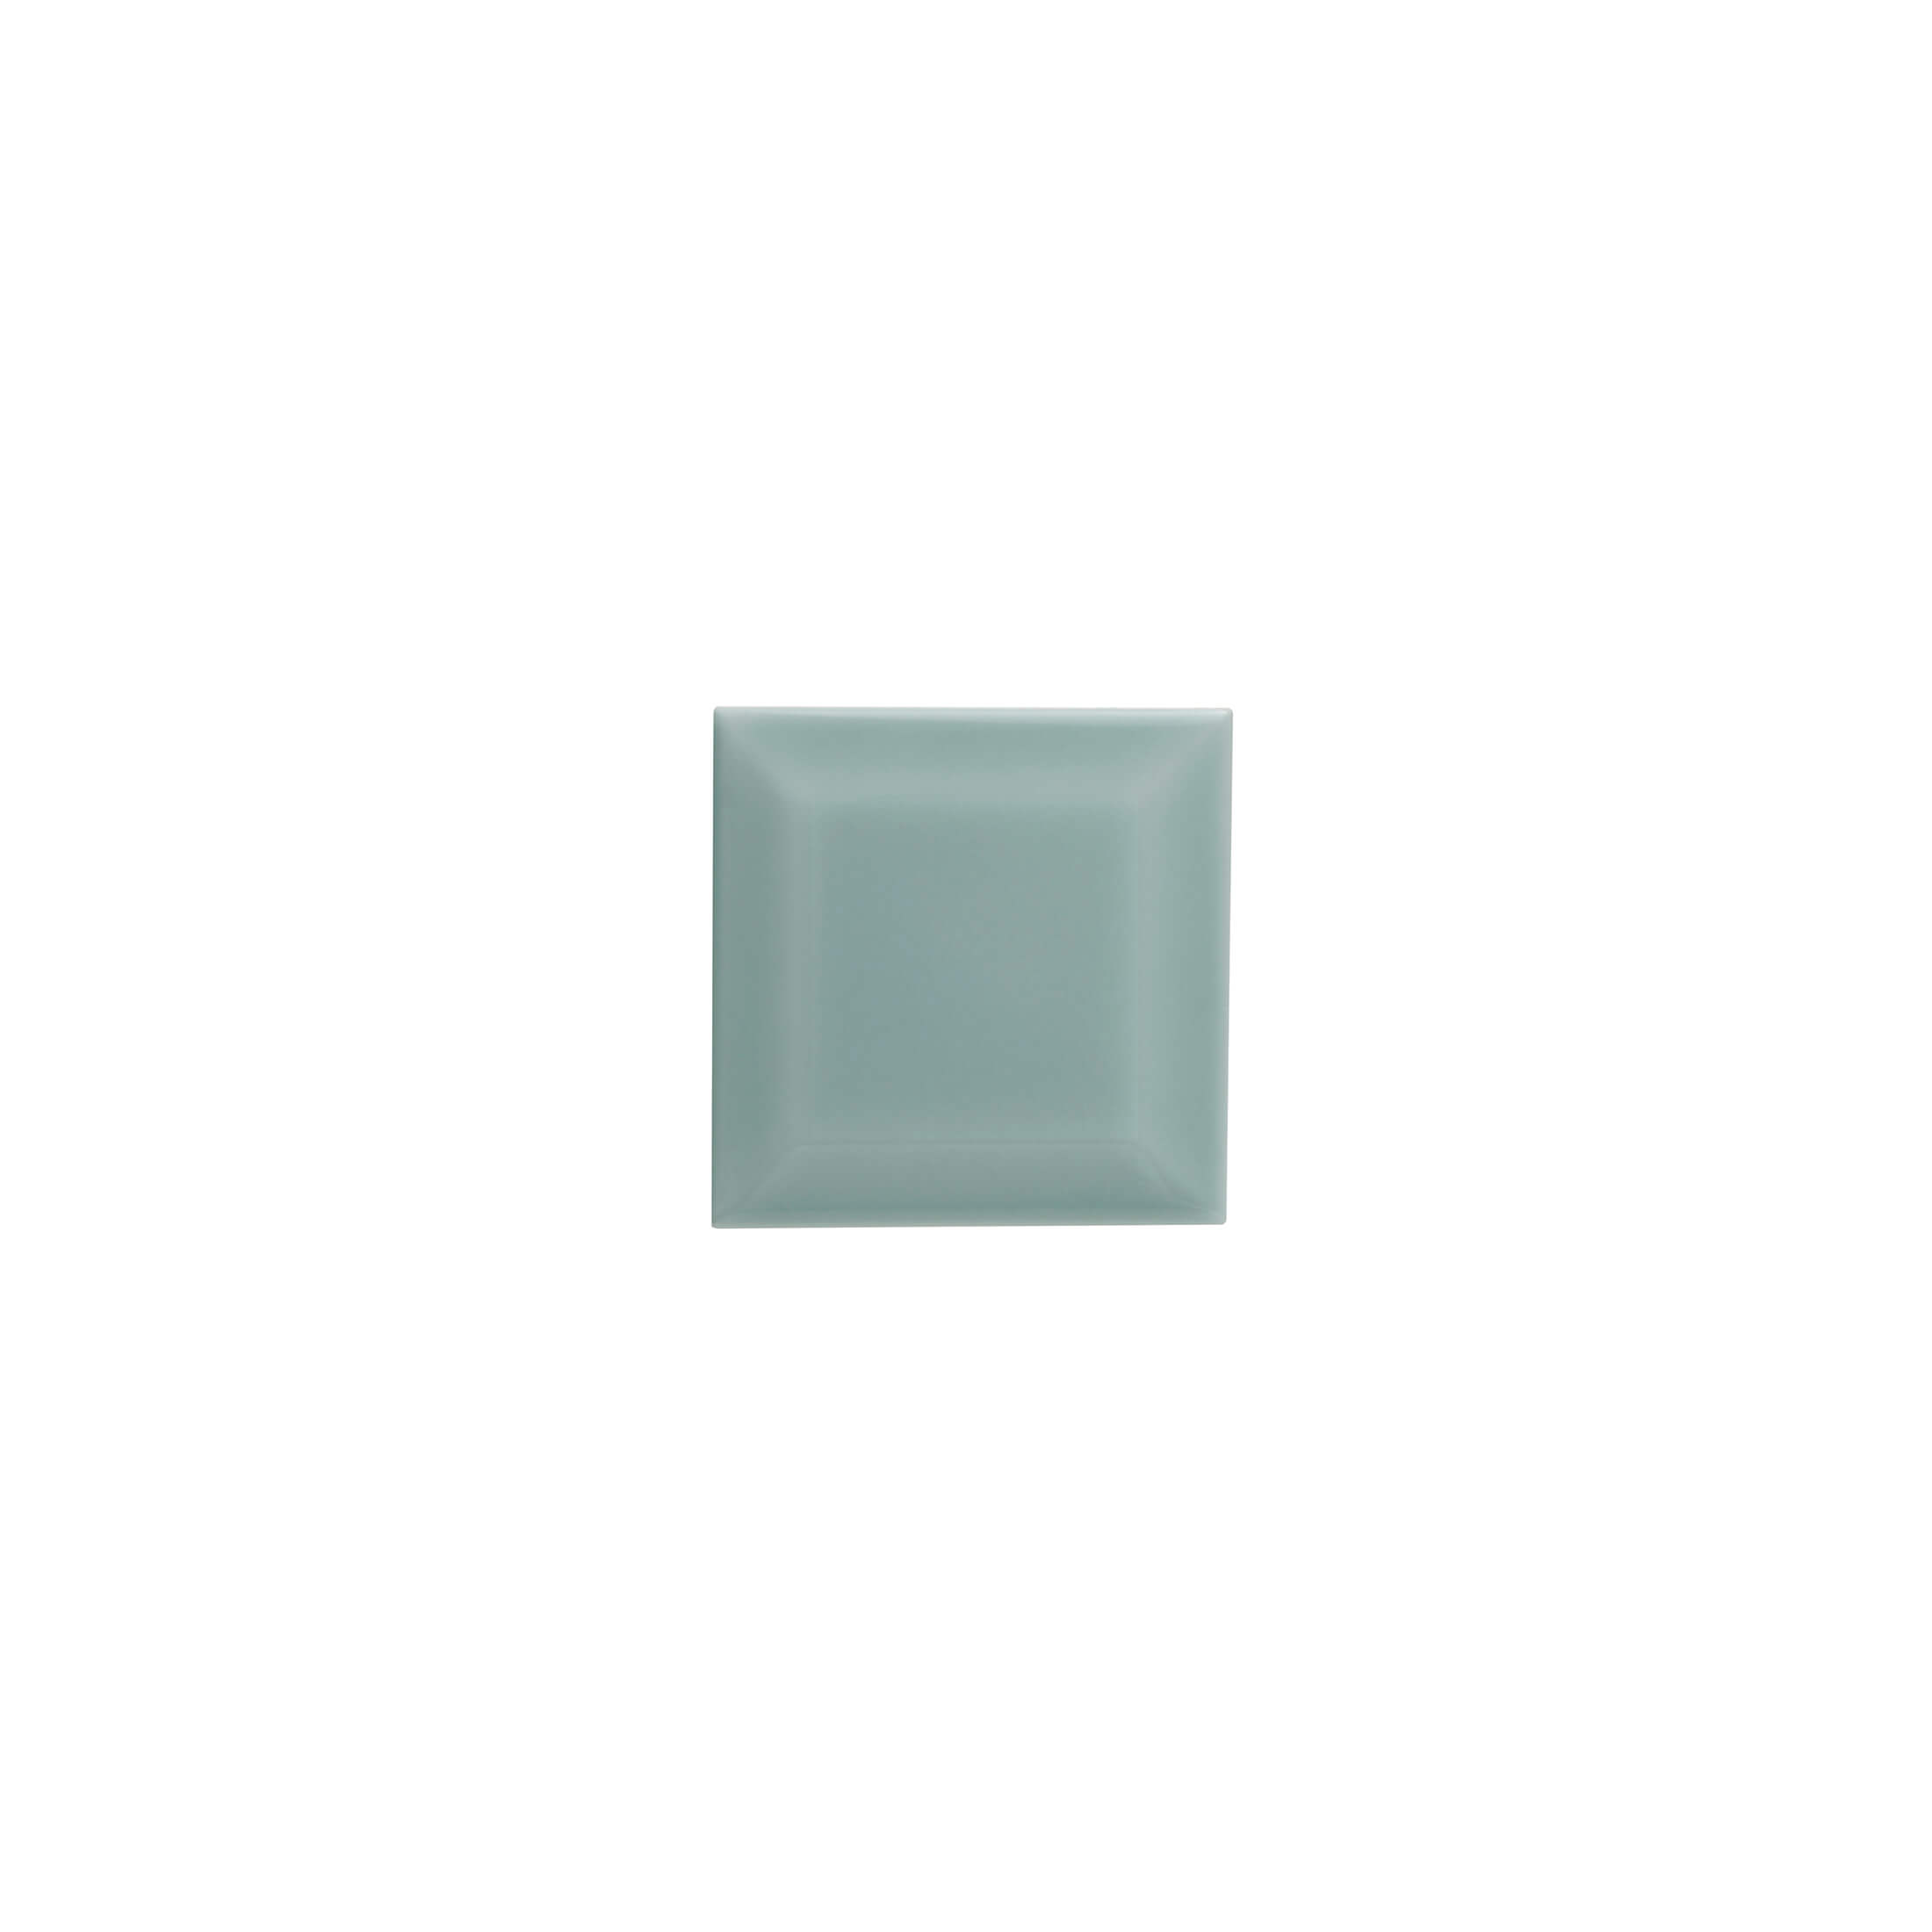 ADNE5634 - BISELADO PB - 7.5 cm X 7.5 cm